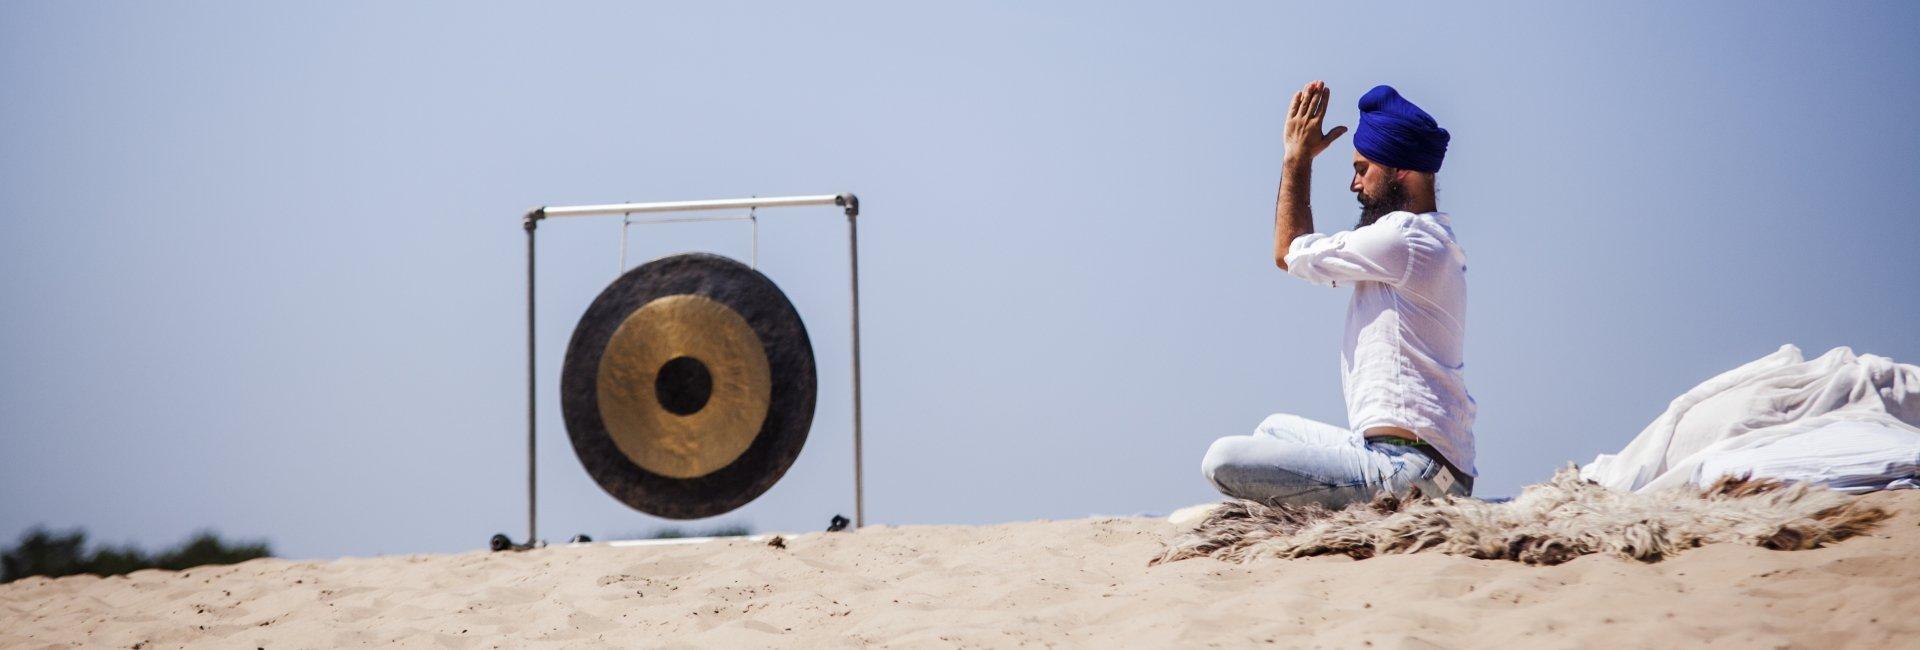 Kundalini Yoga en coach en leraar Guru Gian tijdens meditatie op retraite in Ibiza